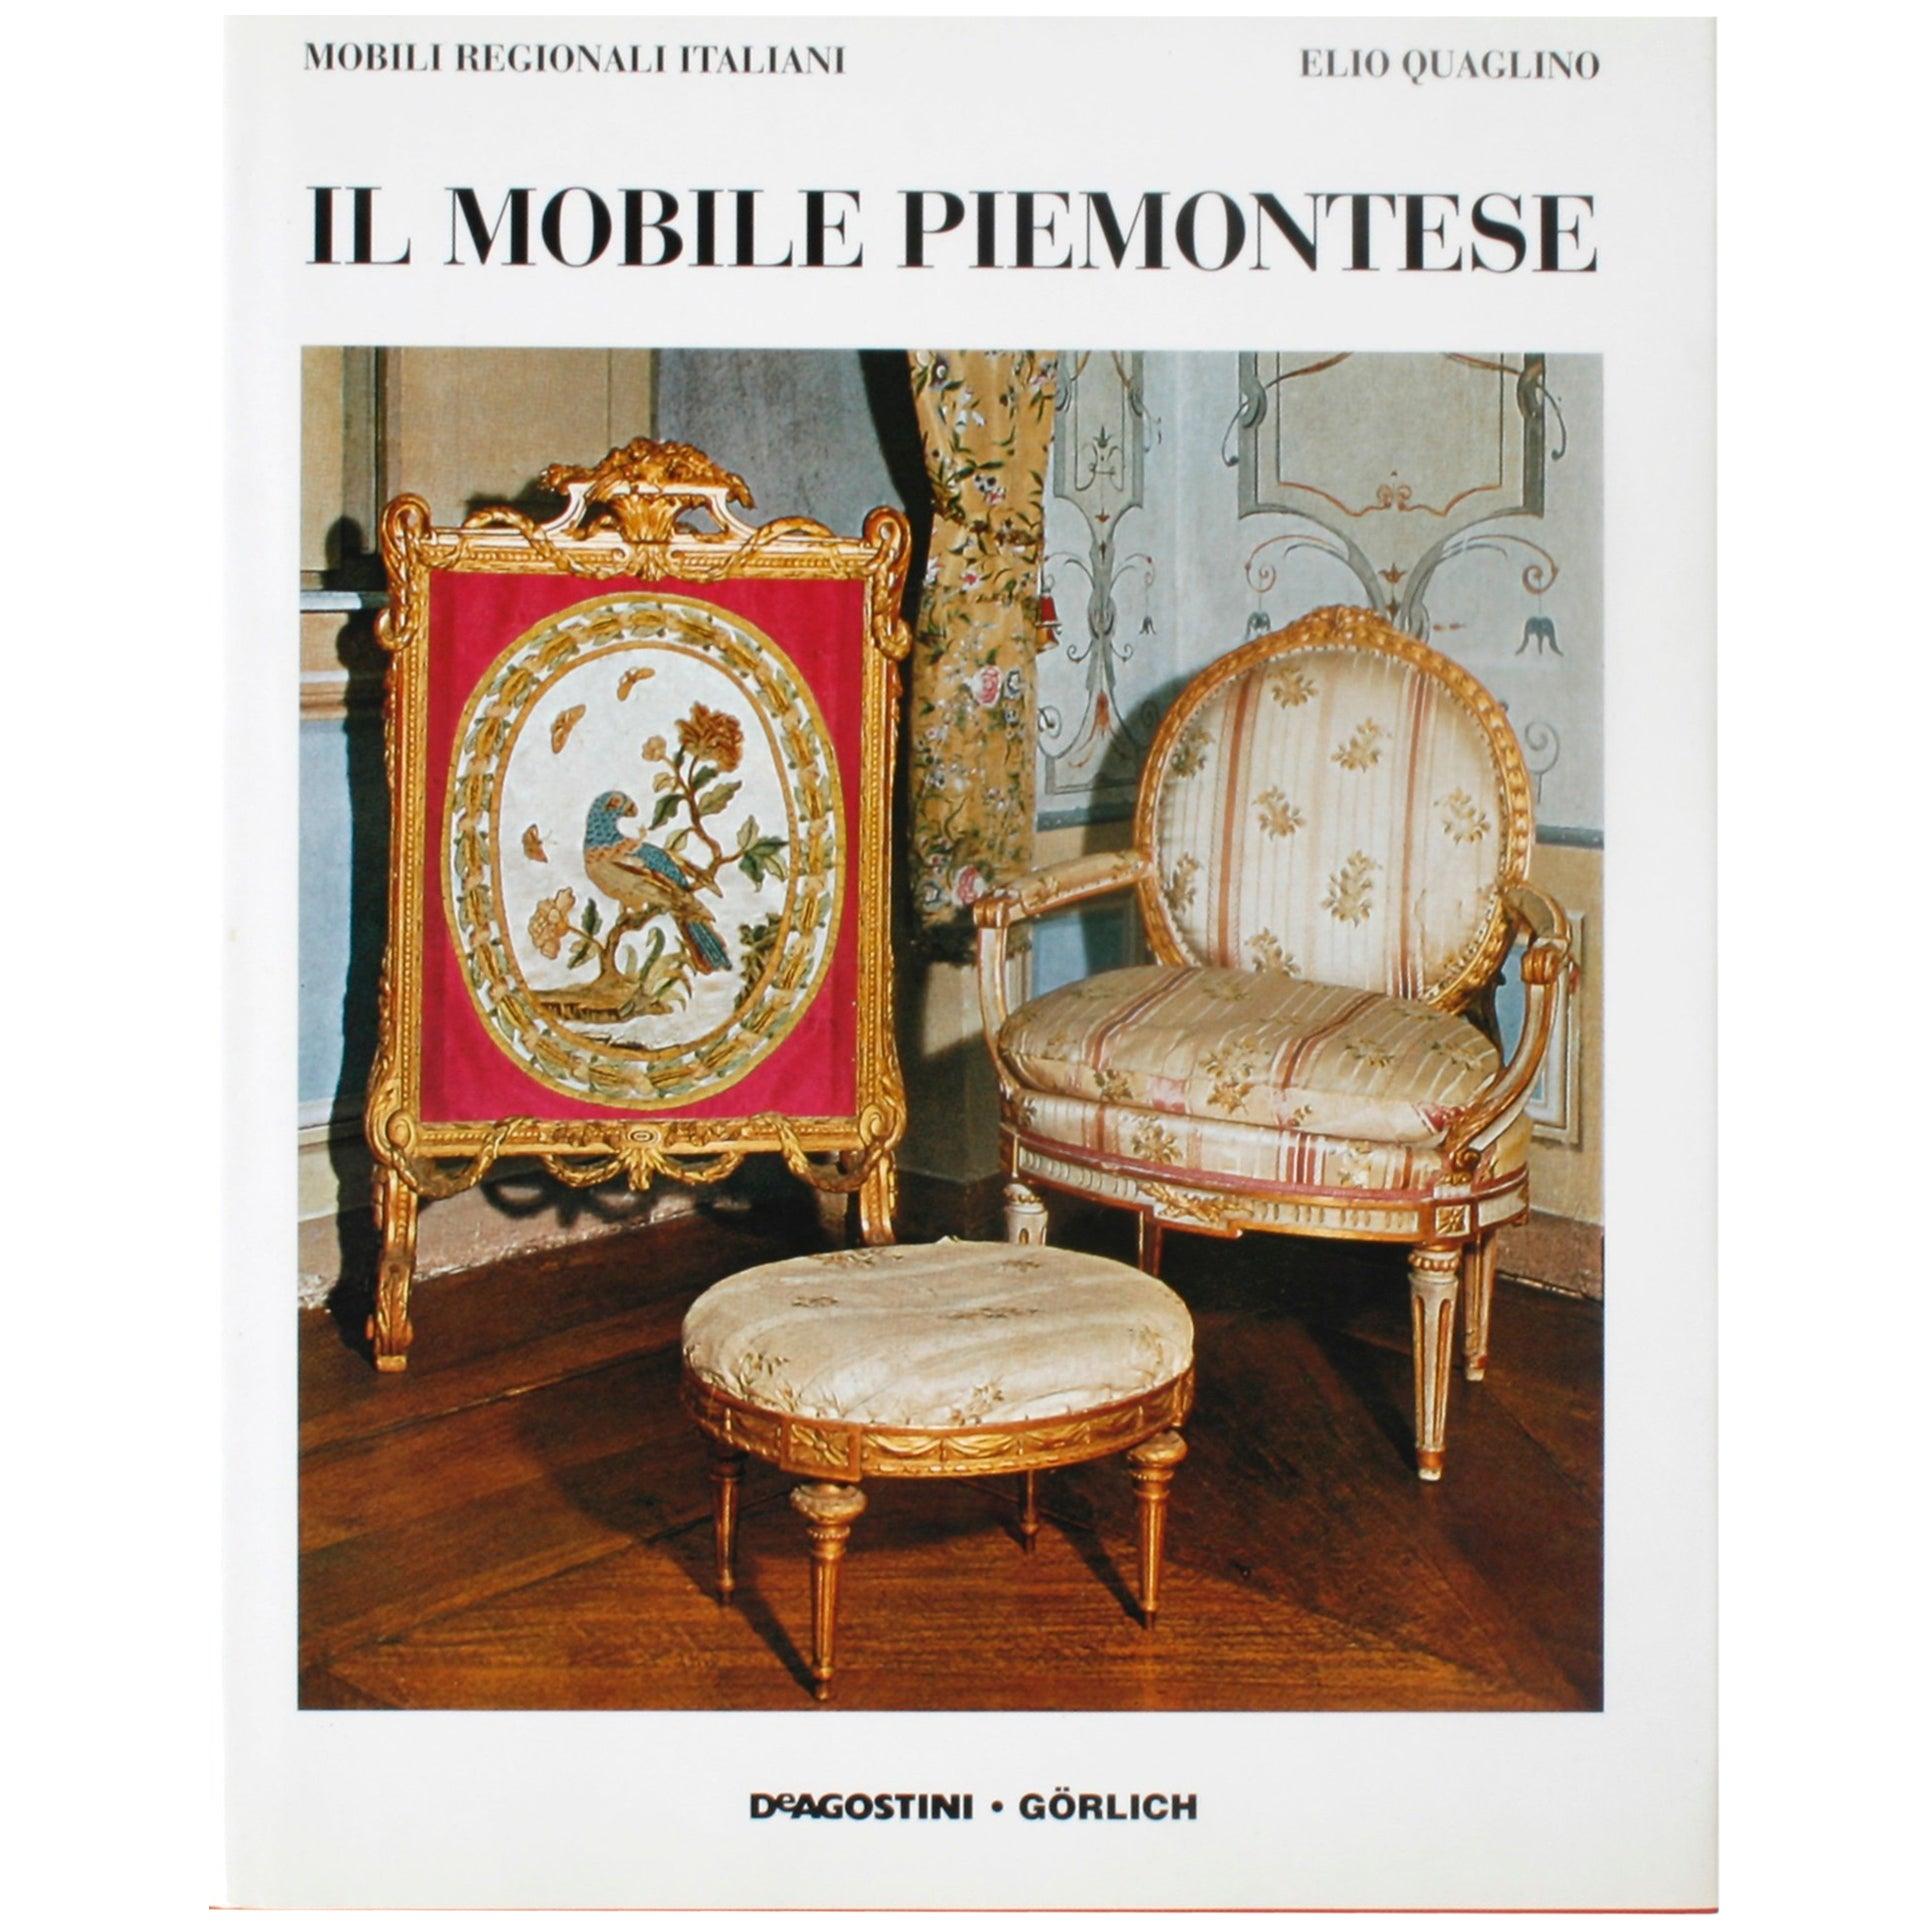 Piedmontese Furniture, First Edition